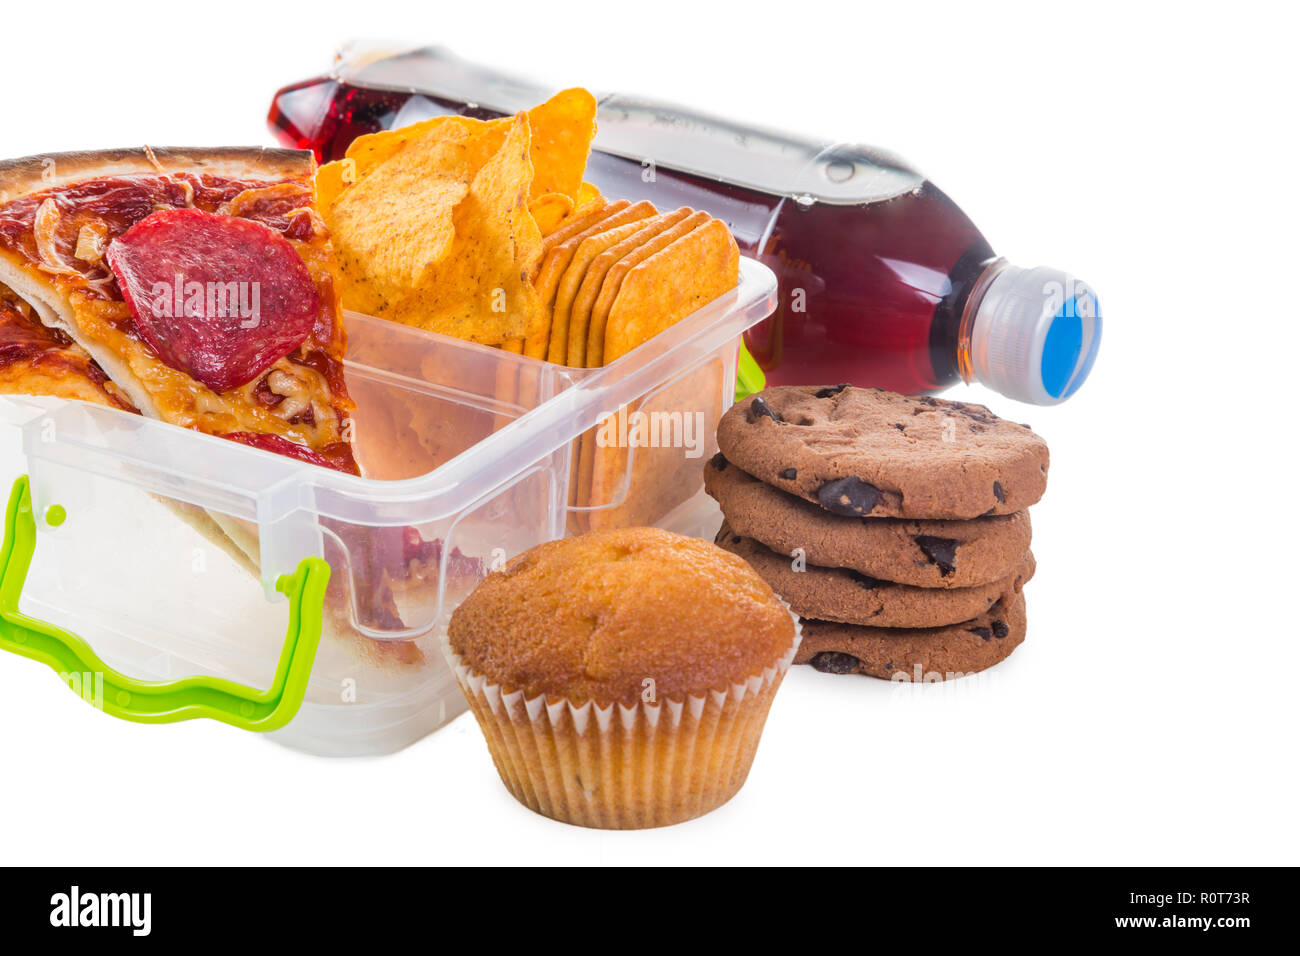 Unhealthy school lunch - Stock Image